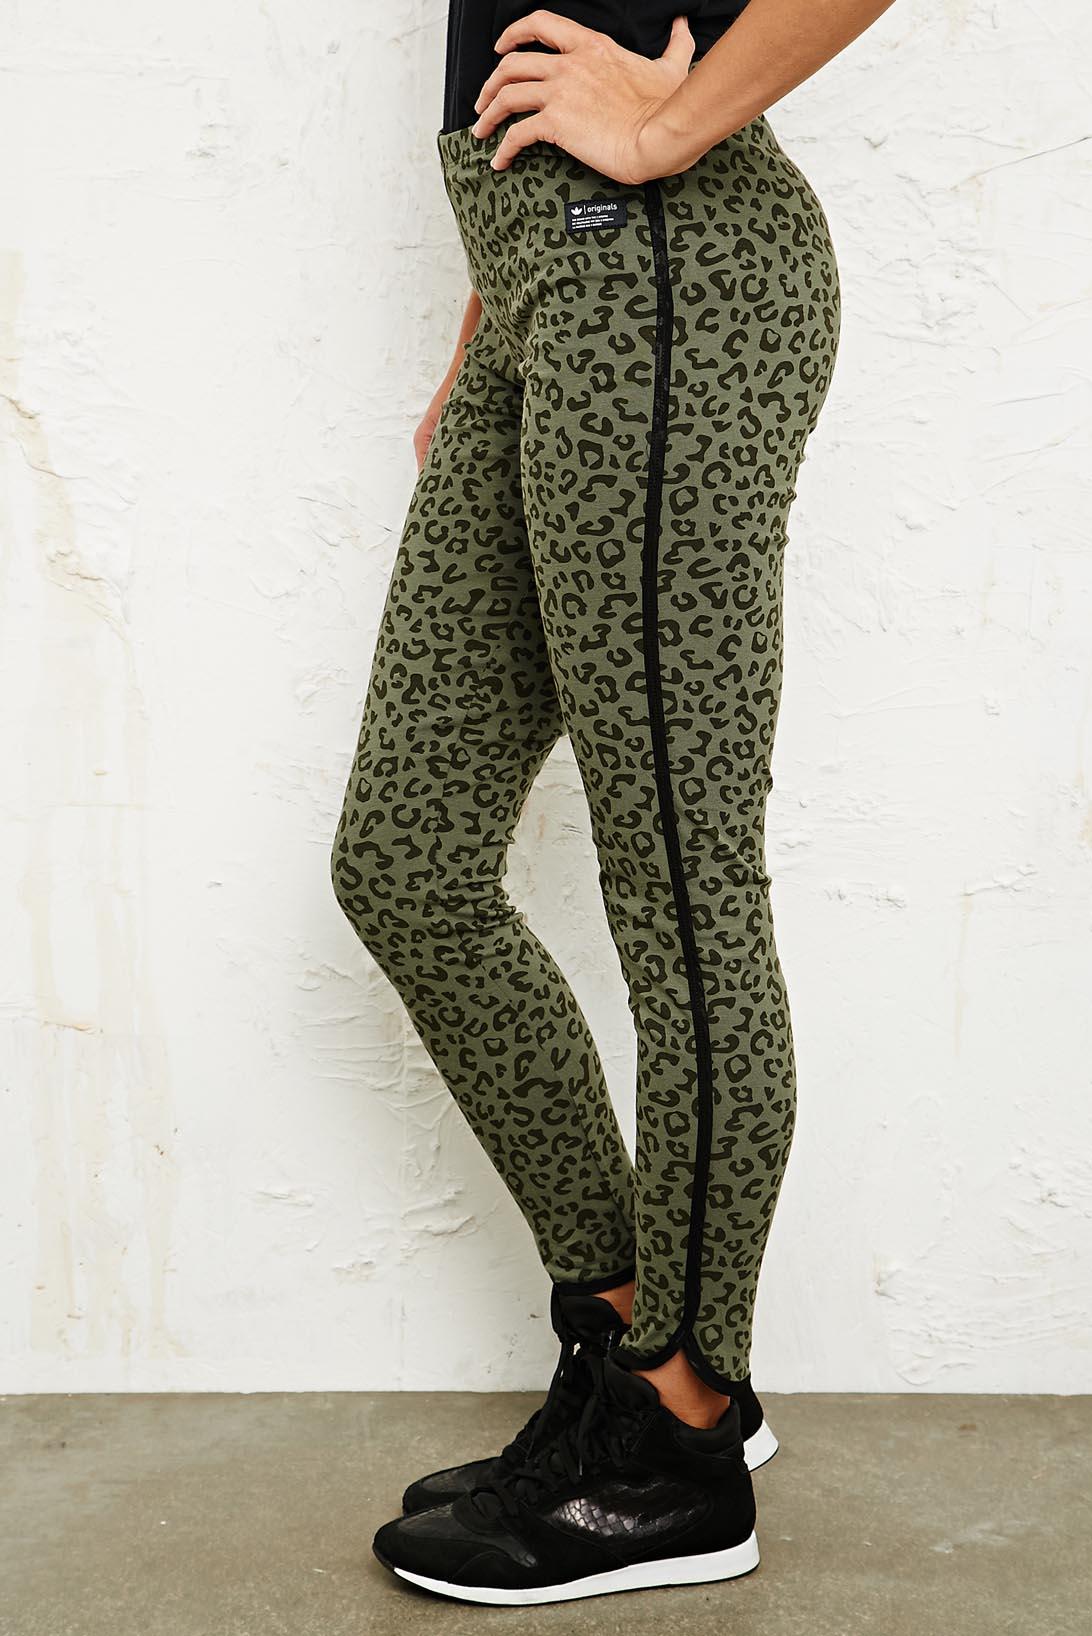 dae97cd81c4 adidas Leggings in Leopard Print - Lyst